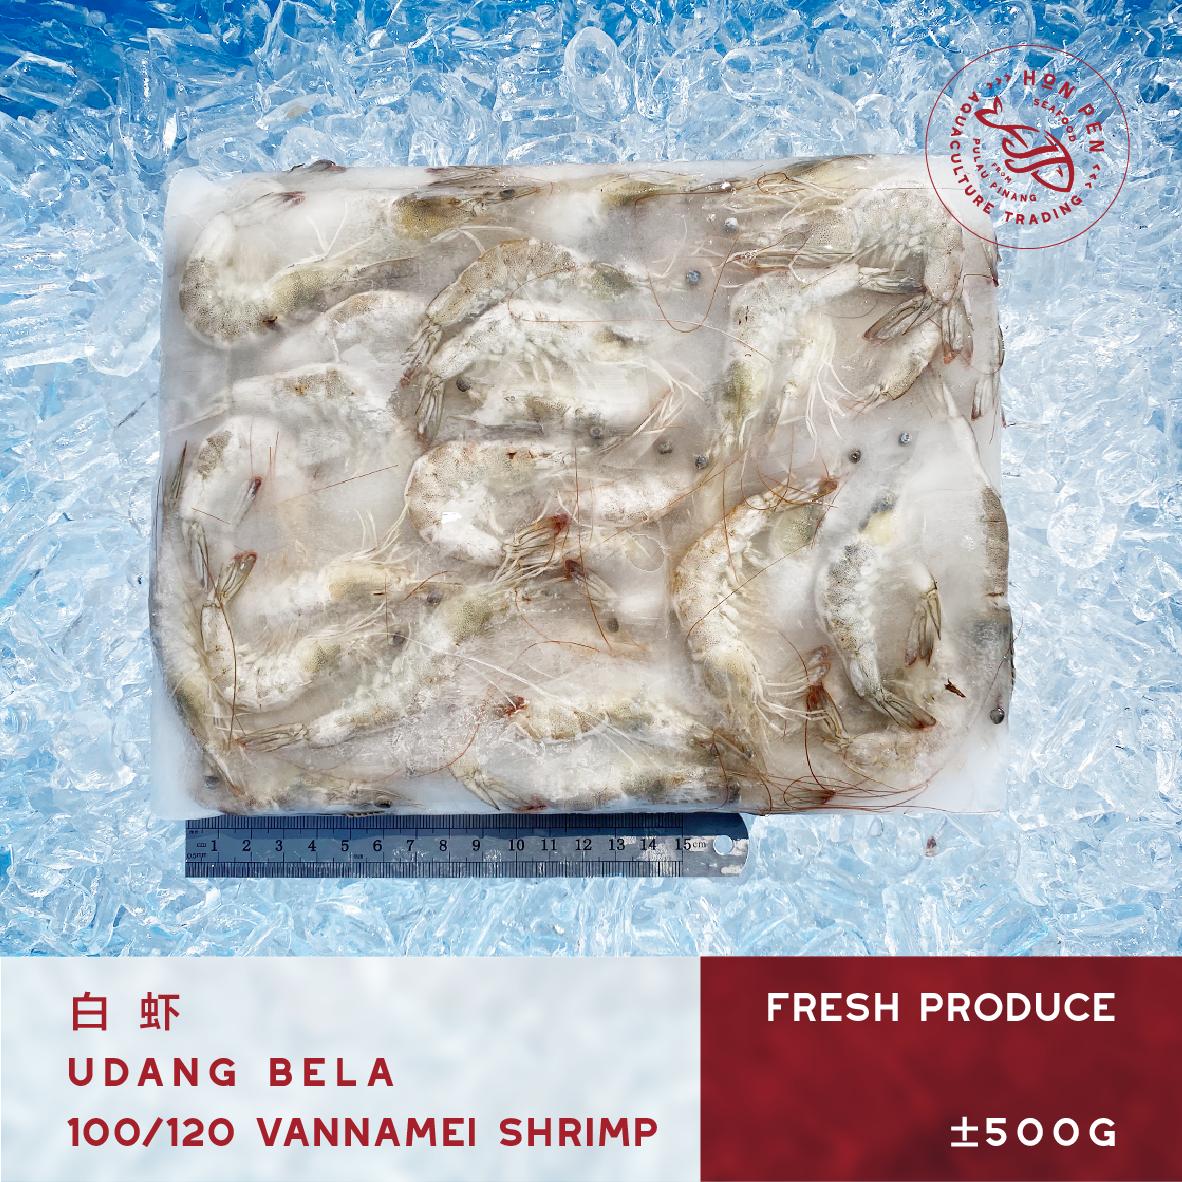 2pcs VANNAMEI SHRIMP 100/120 白虾 UDANG BELA (Seafood) ±500g